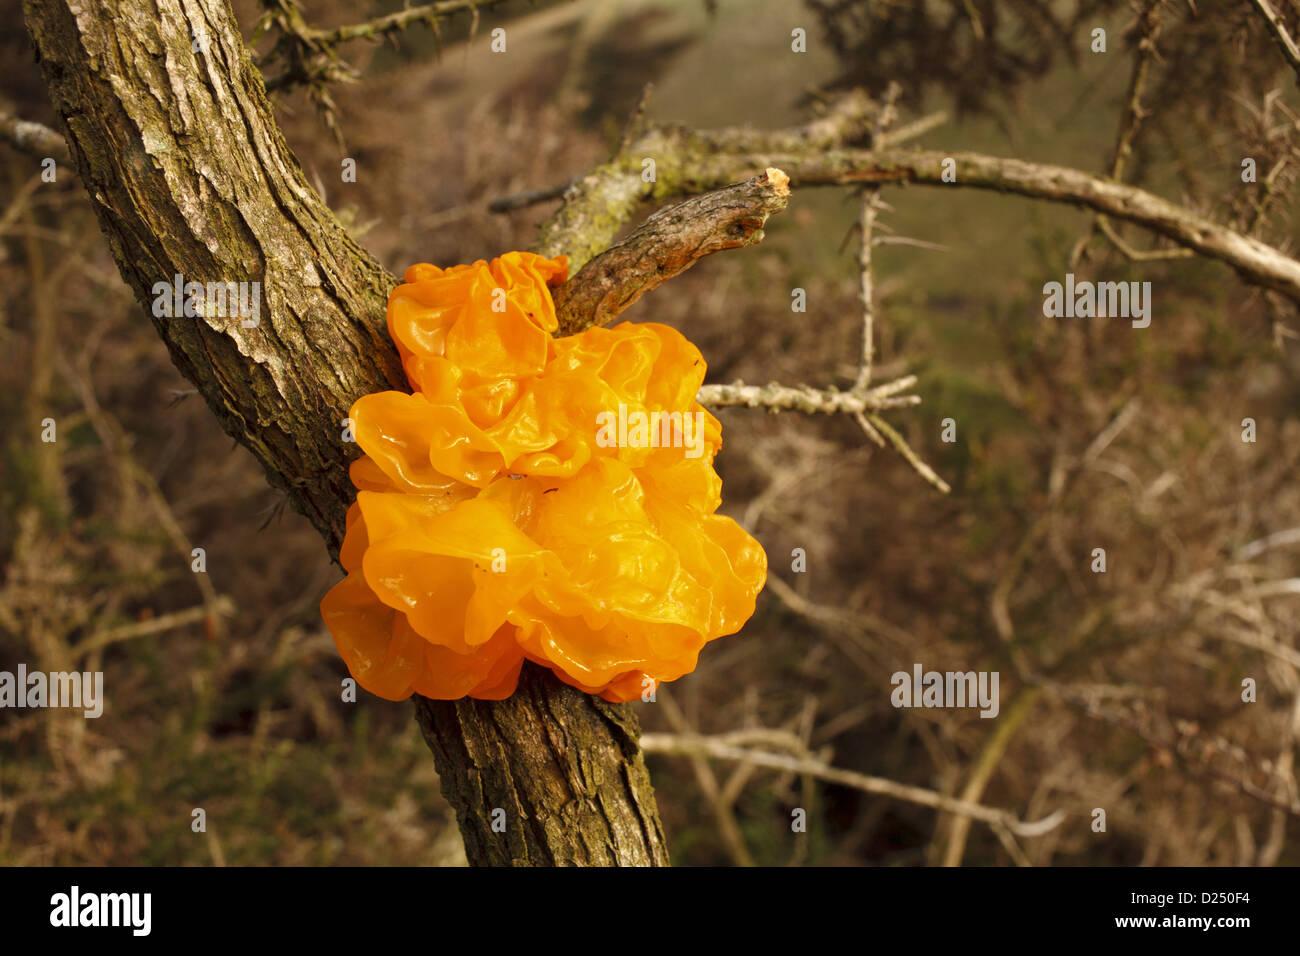 Yellow Brain Fungus (Tremella mesenterica) fruiting body, growing on Gorse (Ulex sp.), Powys, Wales, December - Stock Image